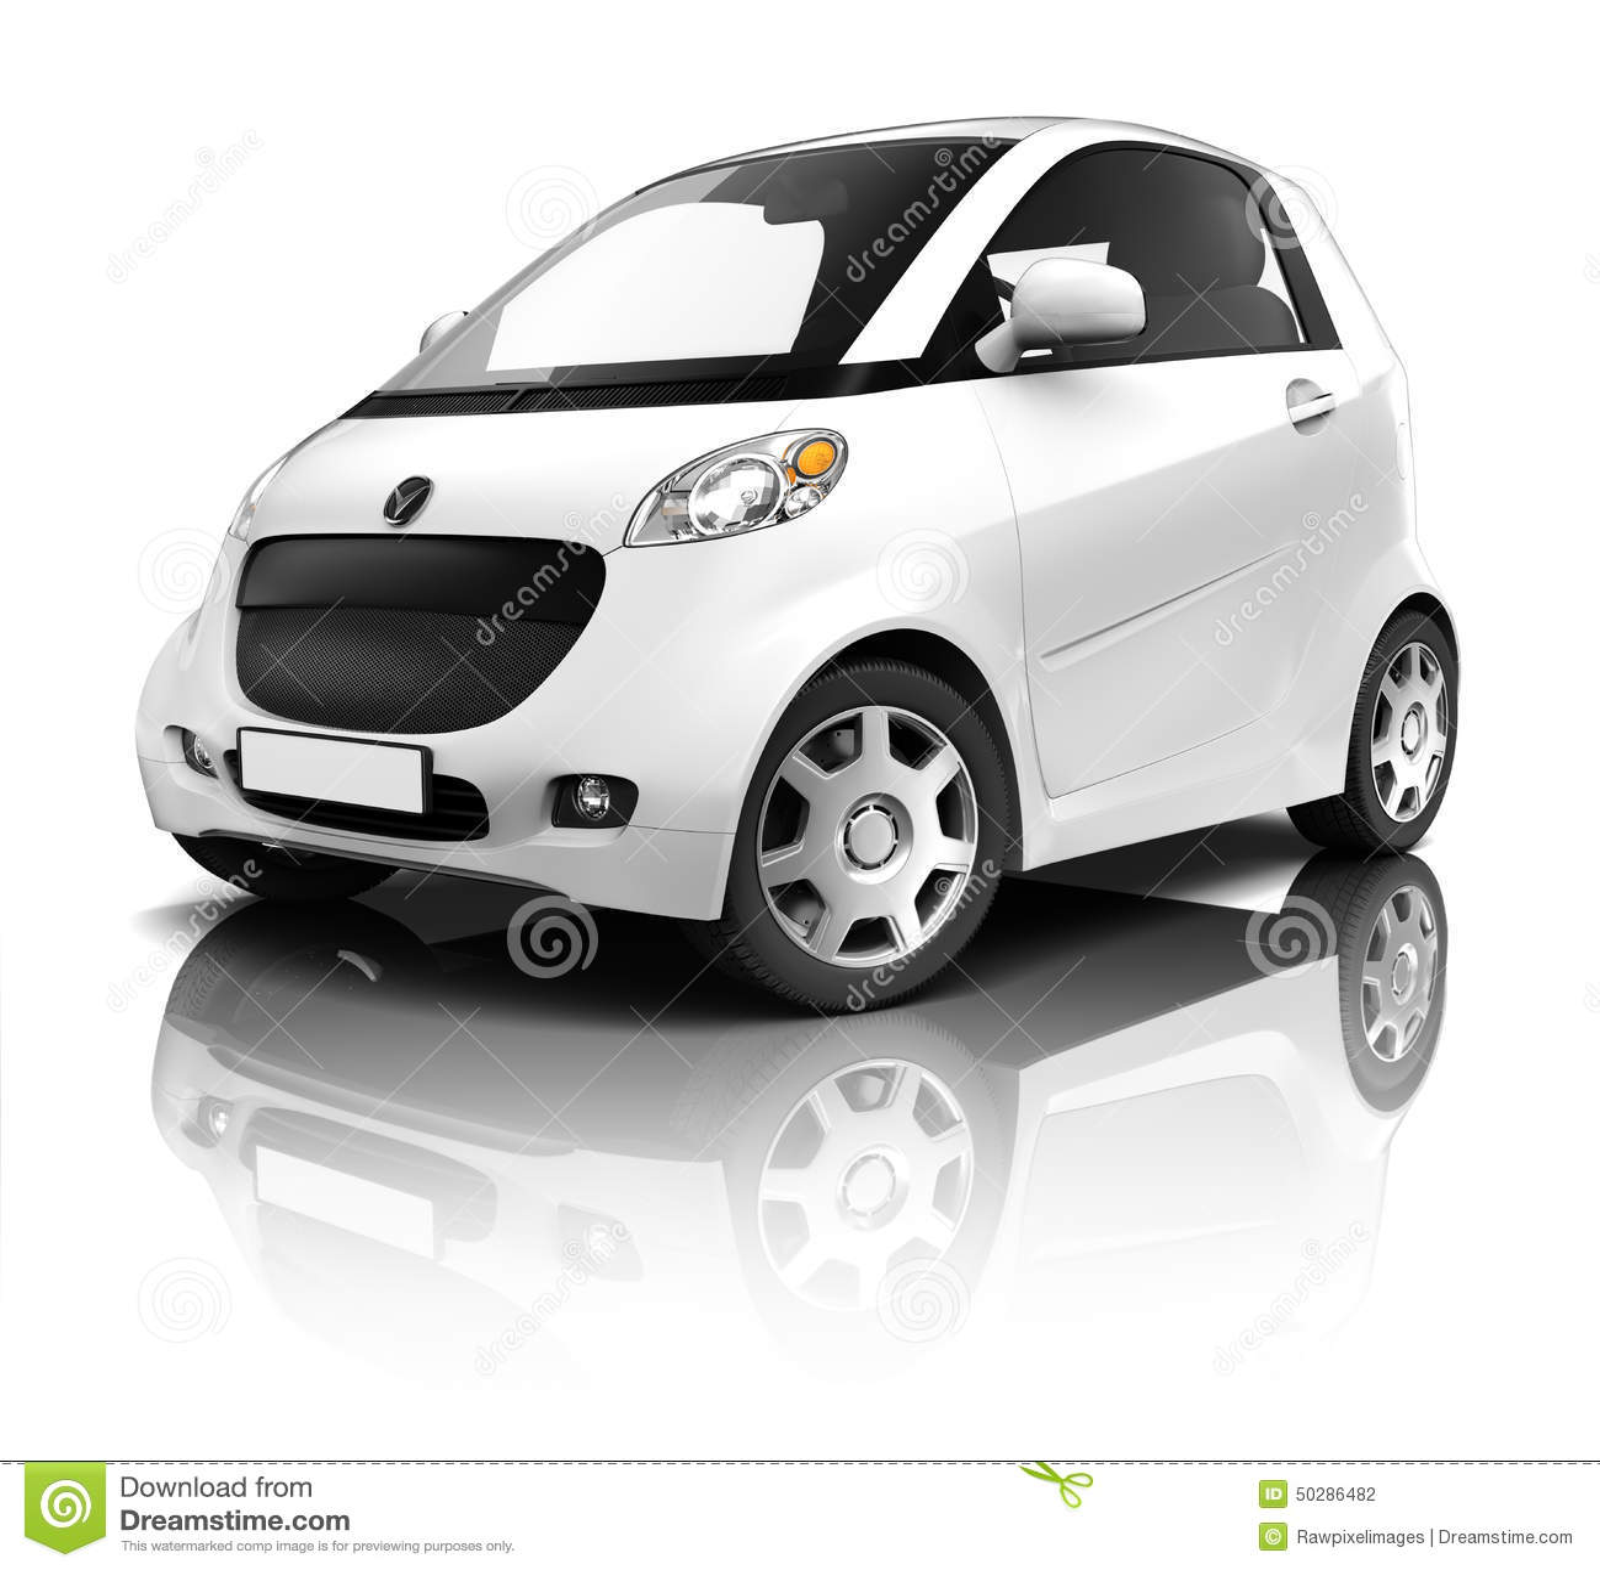 Car Automobile Contemporary Drive Driving Transportation